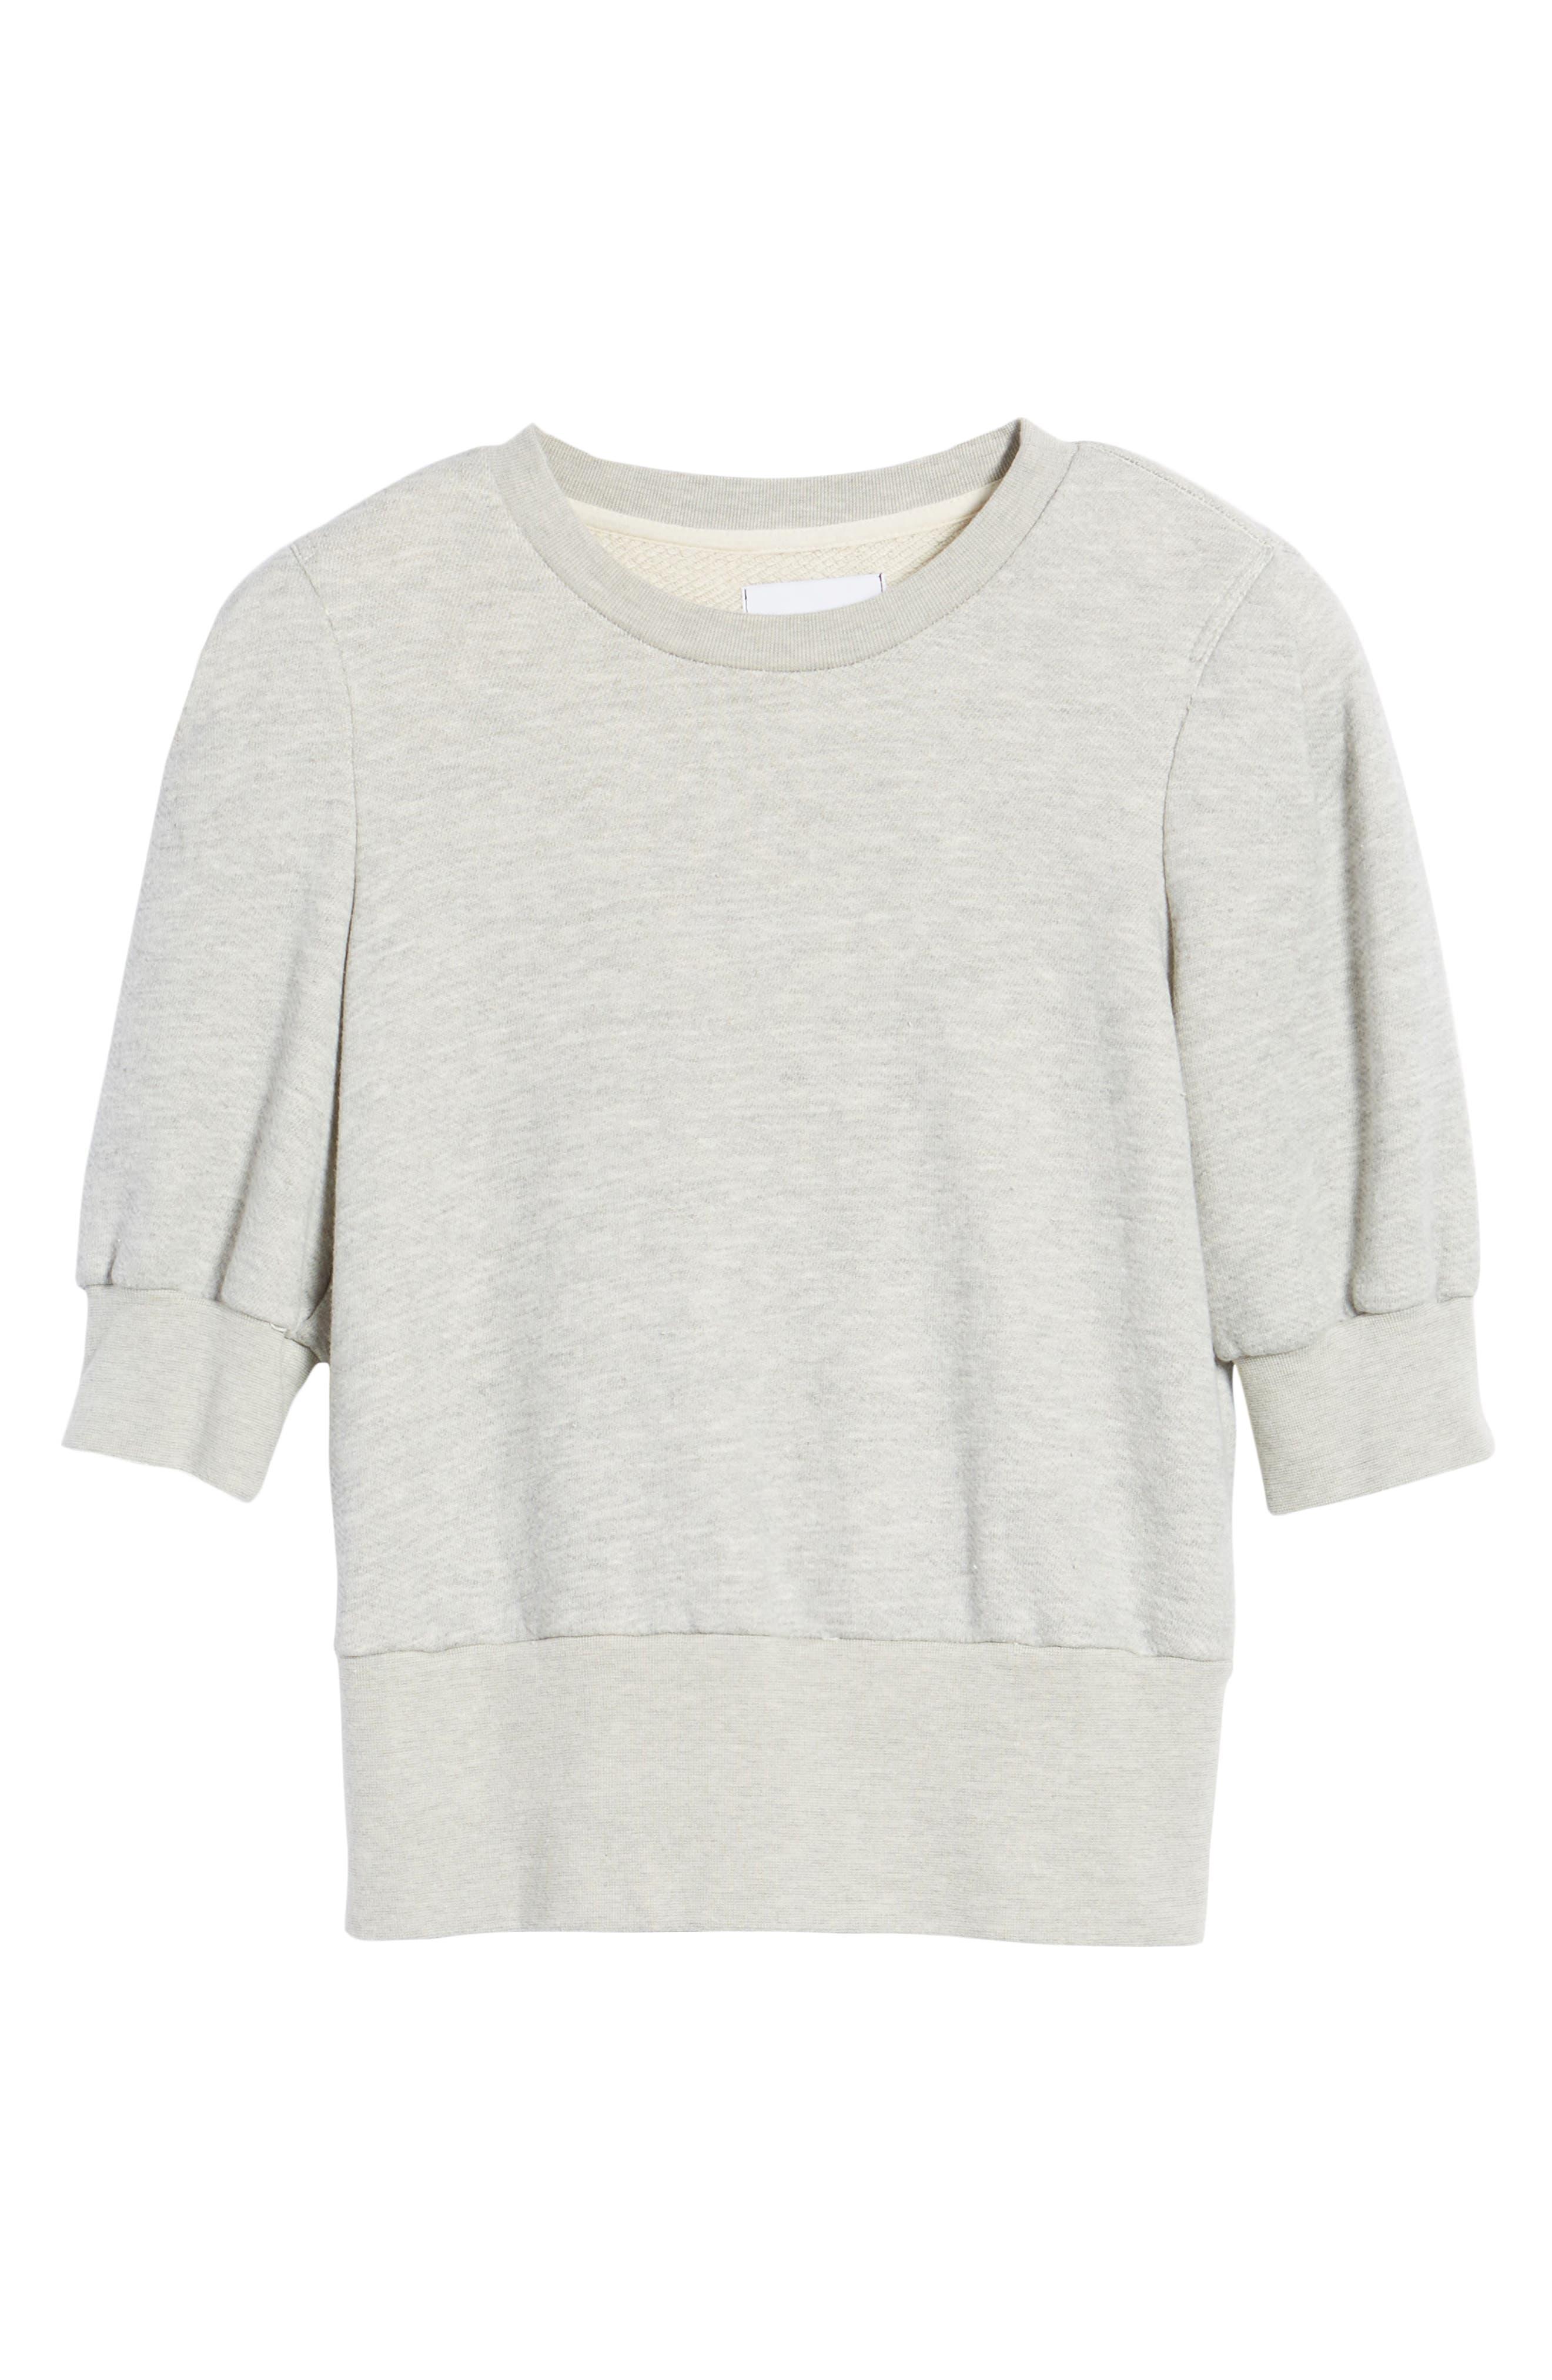 The Pleat Sweatshirt,                             Alternate thumbnail 6, color,                             Light Heather Grey Terry